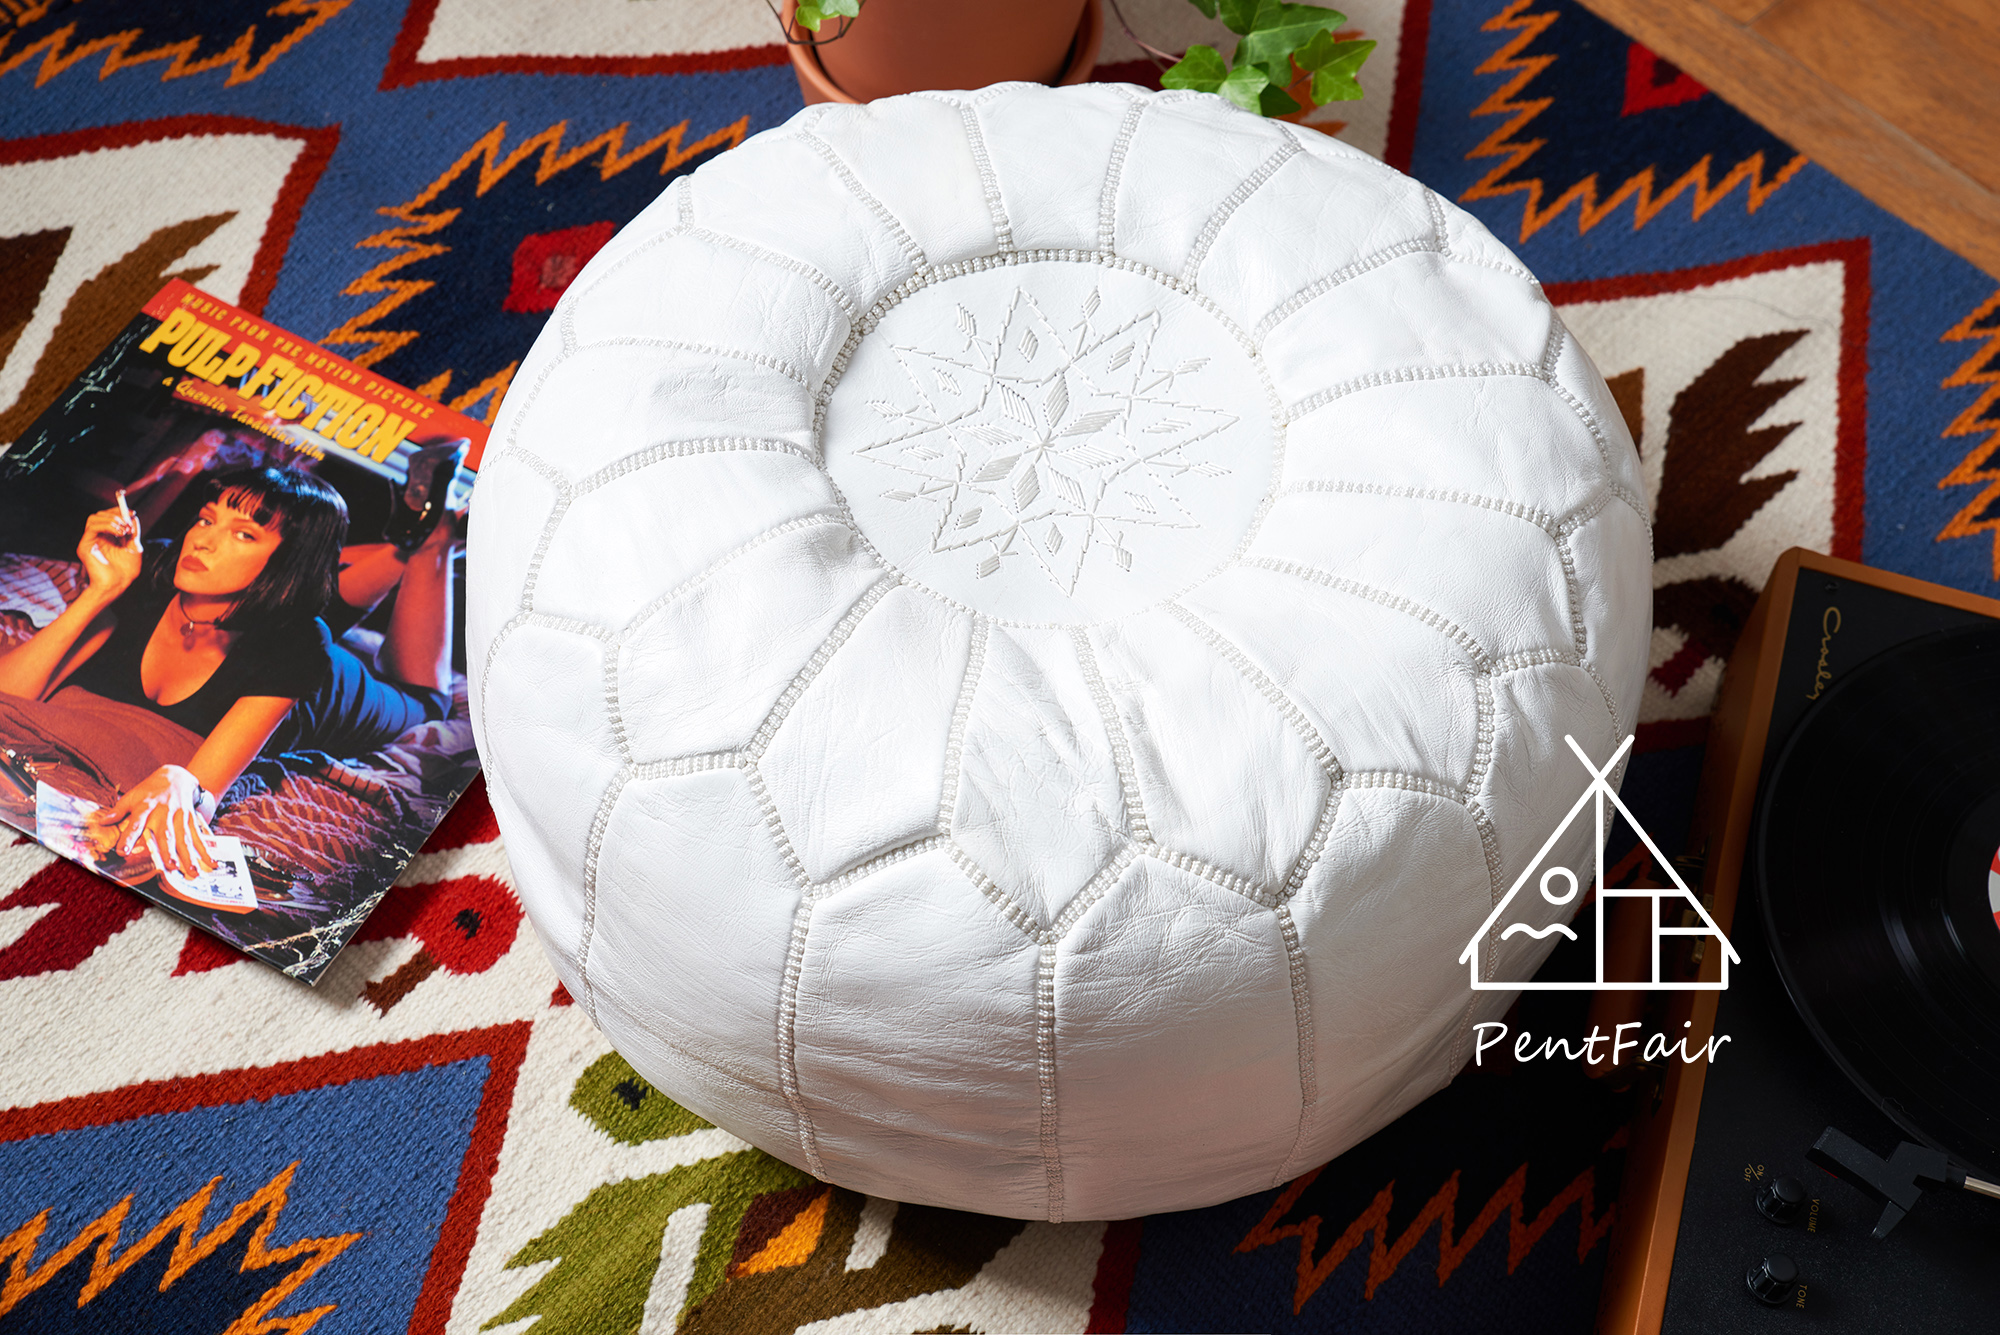 Татами leather pouf 摩洛哥皮墩曼达拉绣花手工羊皮蒲团坐垫坐墩 现货